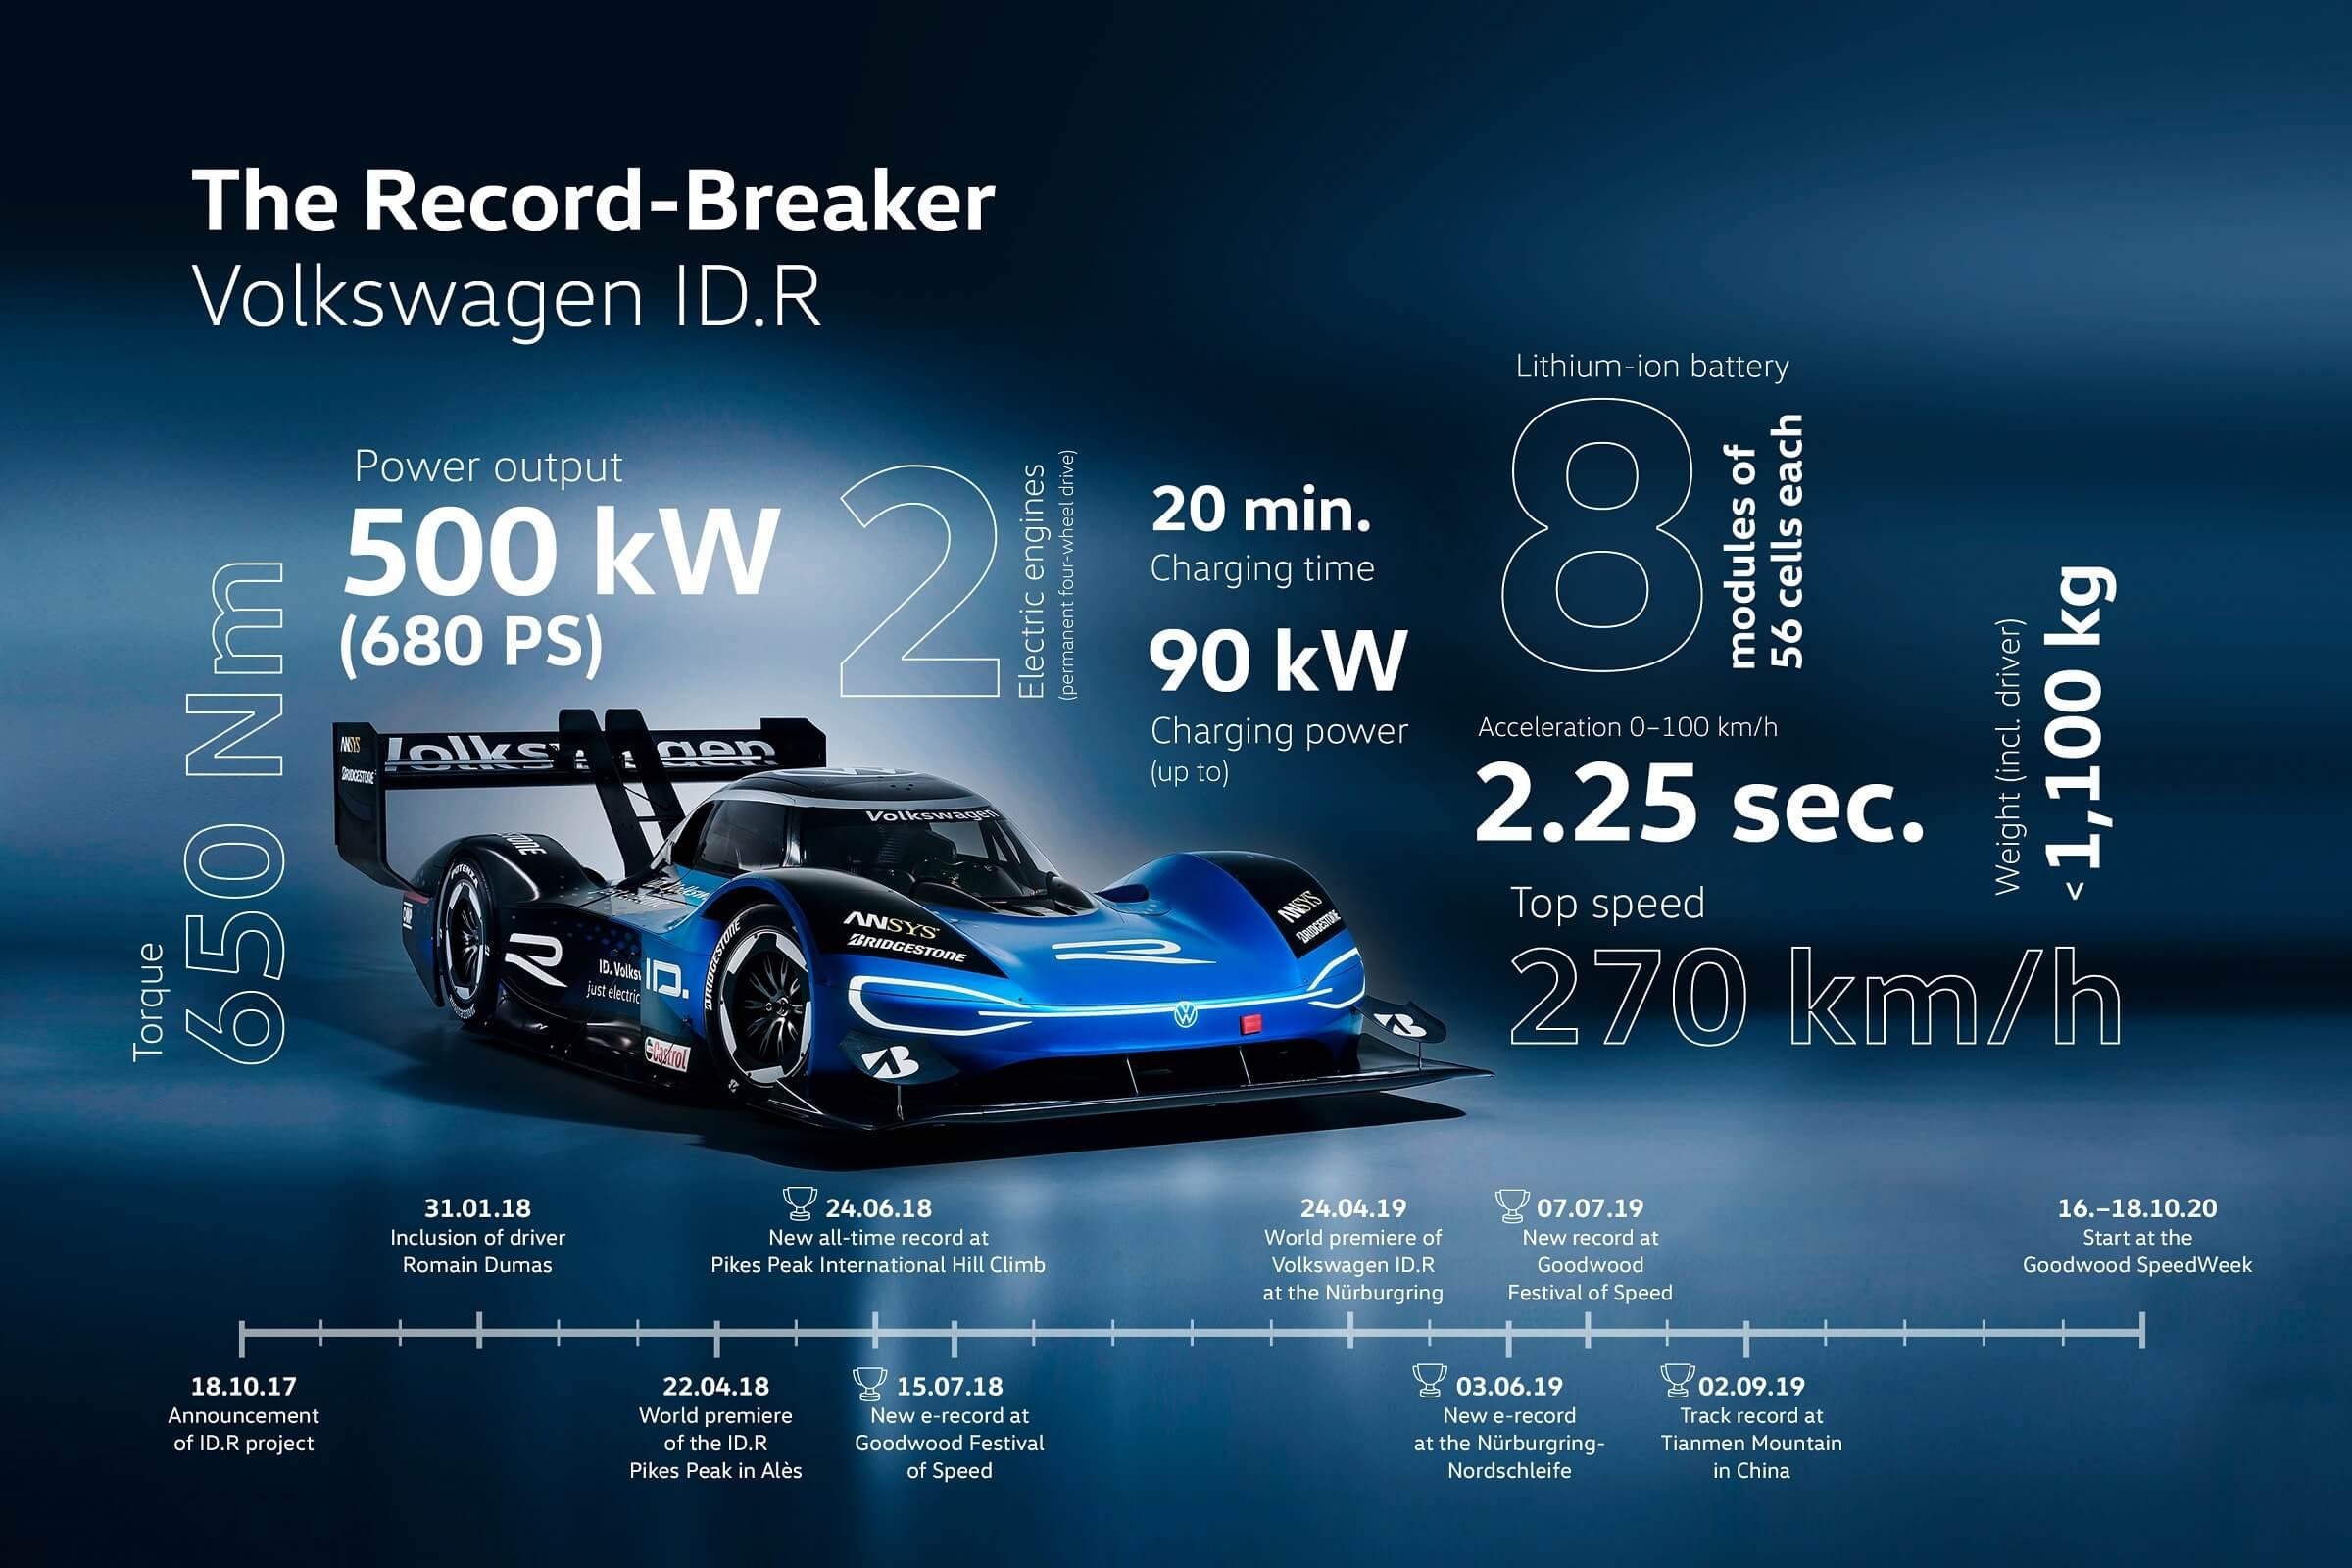 VW ID.R χαρακτηριστικά και χρονολόγιο - Infographic